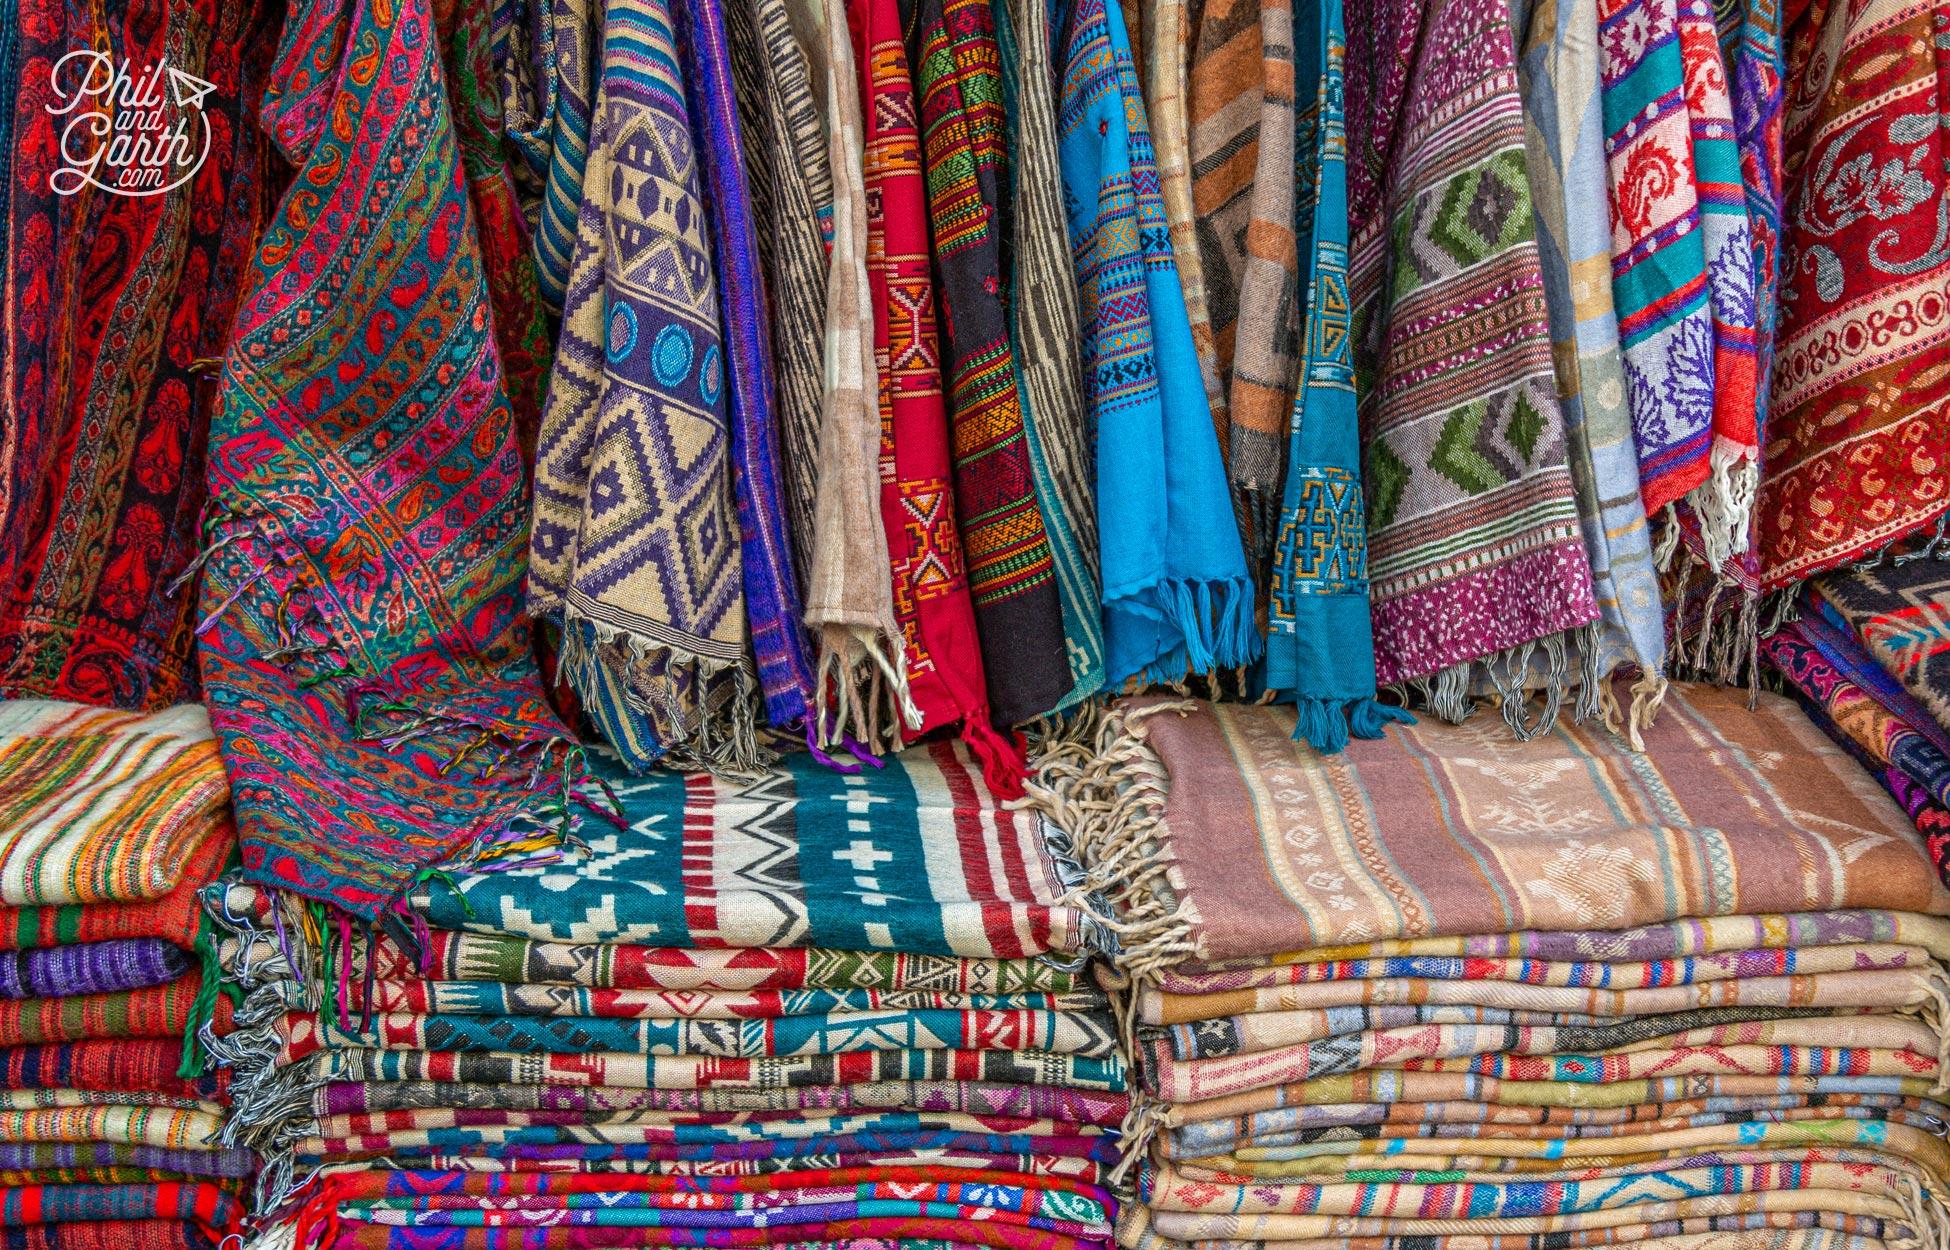 Colourful pashminas for sale in a Pushkar bazaar